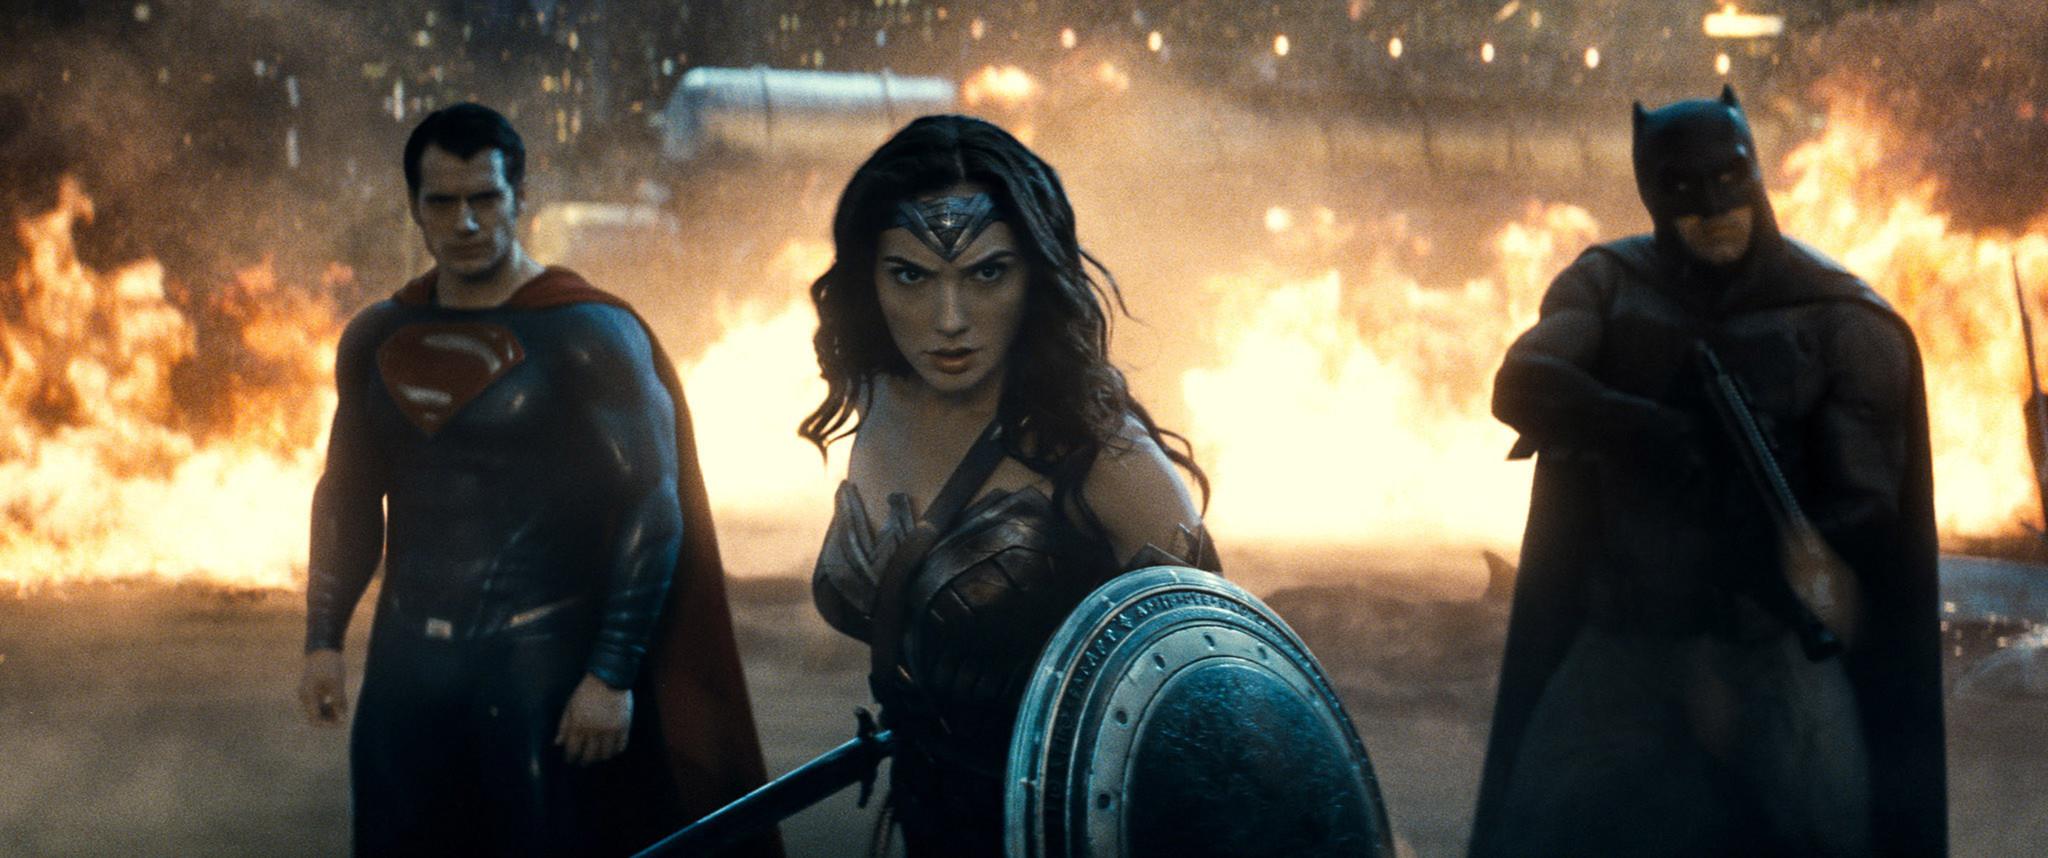 "Henry Cavill, left, Gal Gadot and Ben Affleck in ""Batman v Superman: Dawn of Justice."""